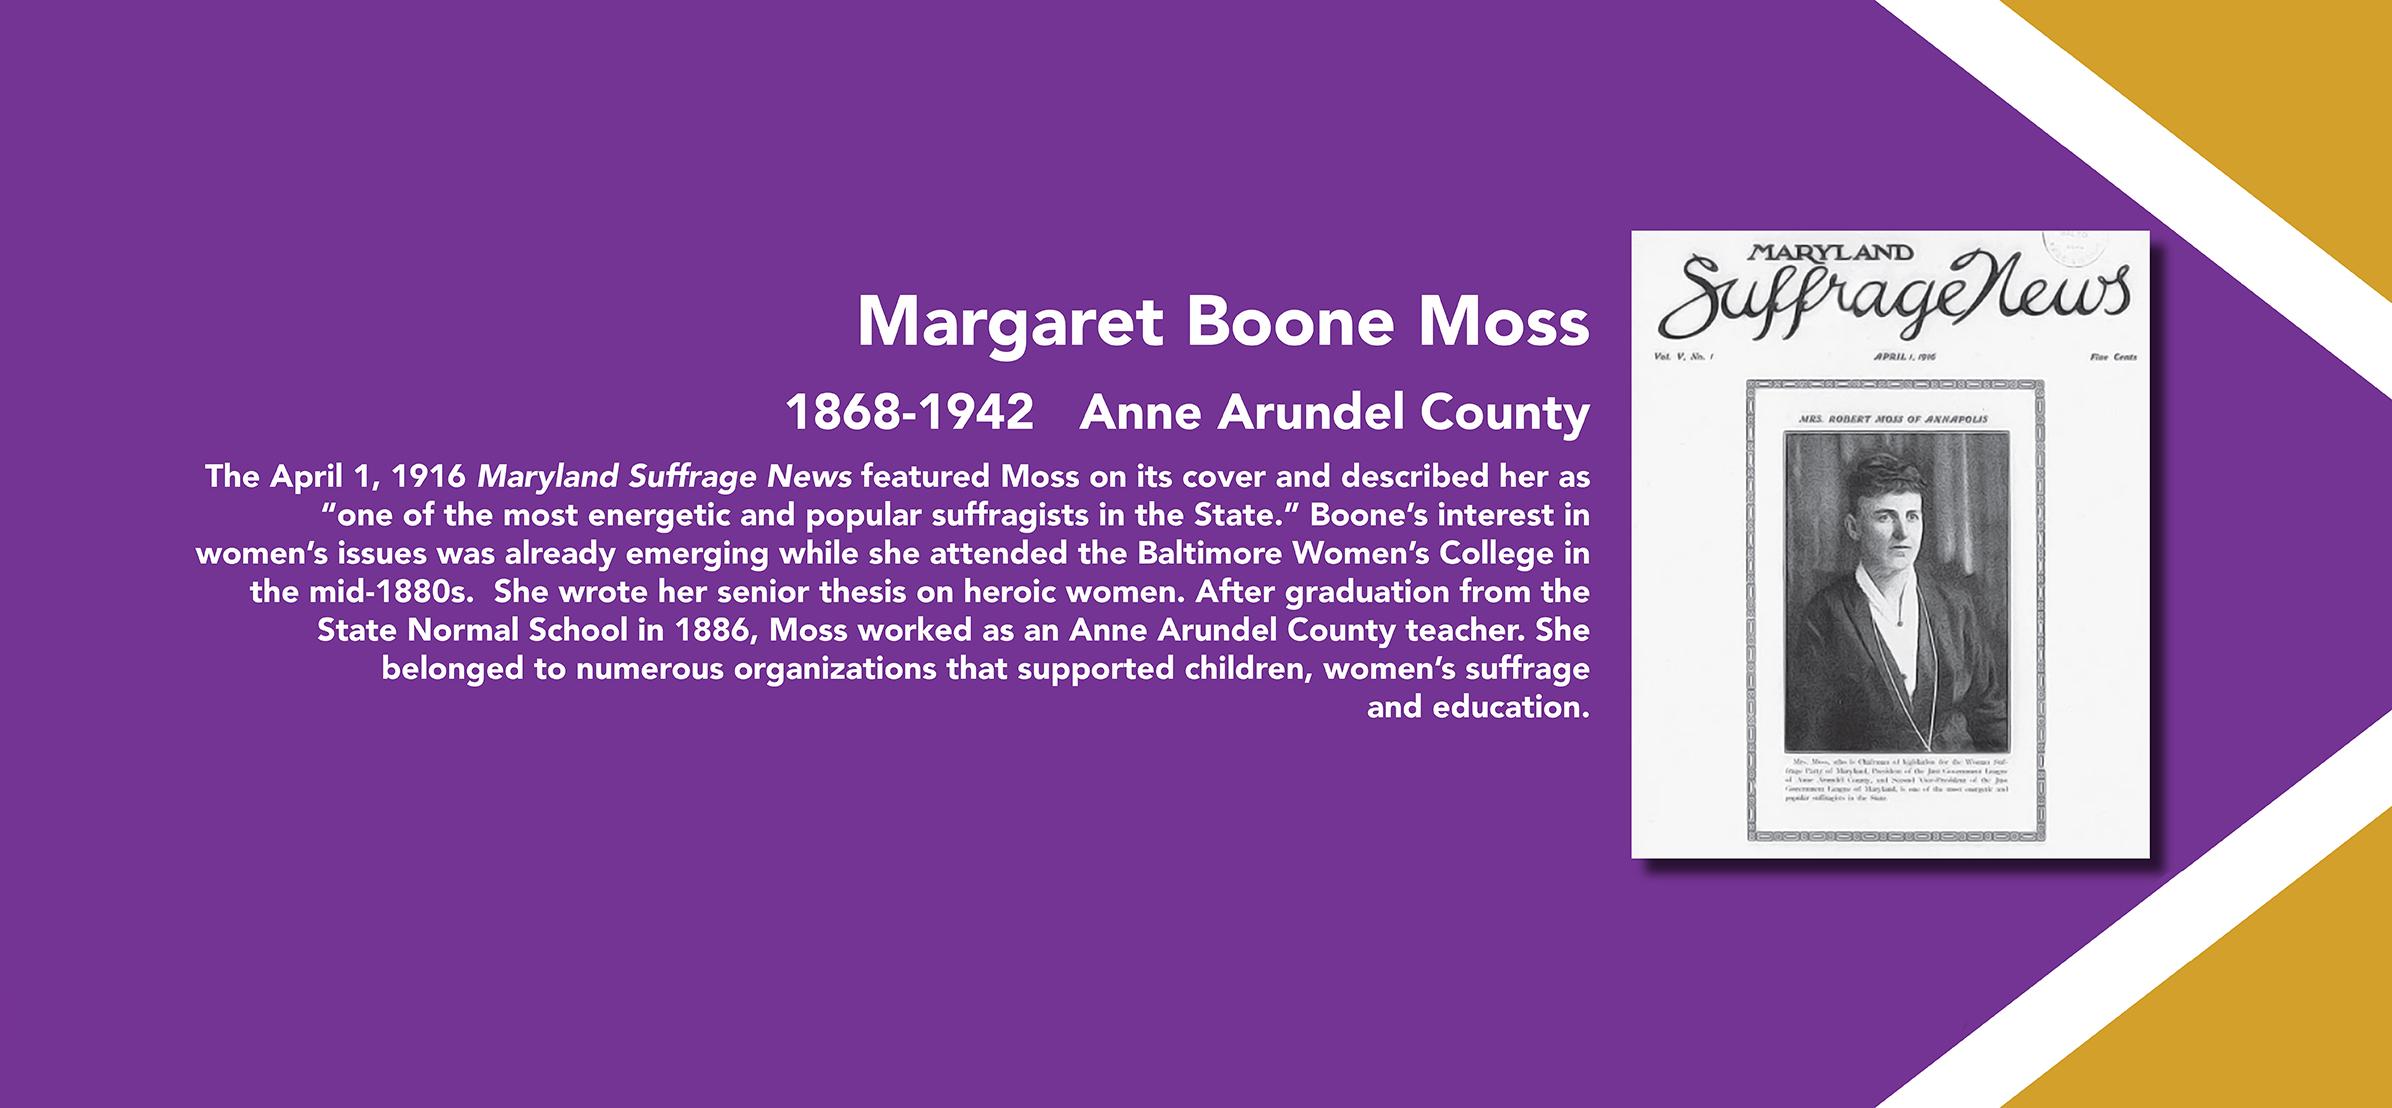 MargaretBooneMoss